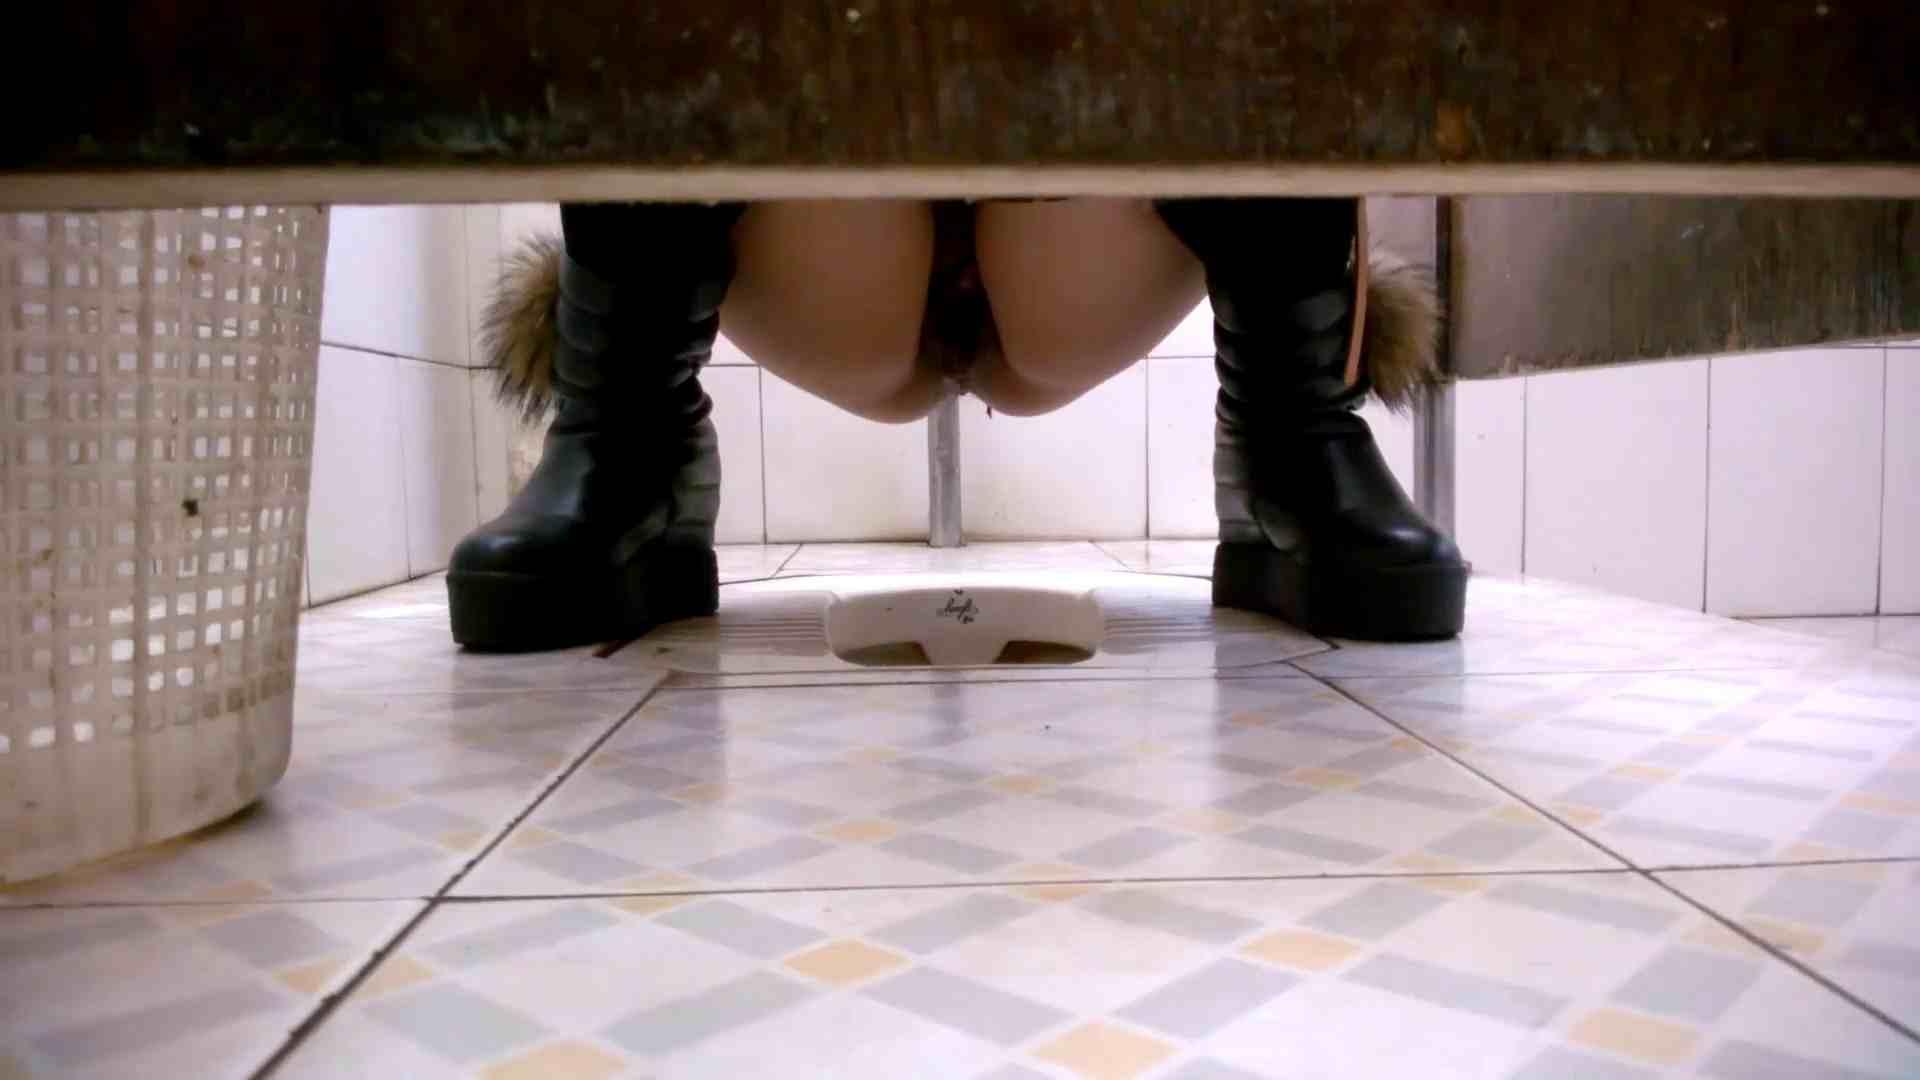 JD盗撮 美女の洗面所の秘密 Vol.34 美女のボディ ぱこり動画紹介 73PIX 29